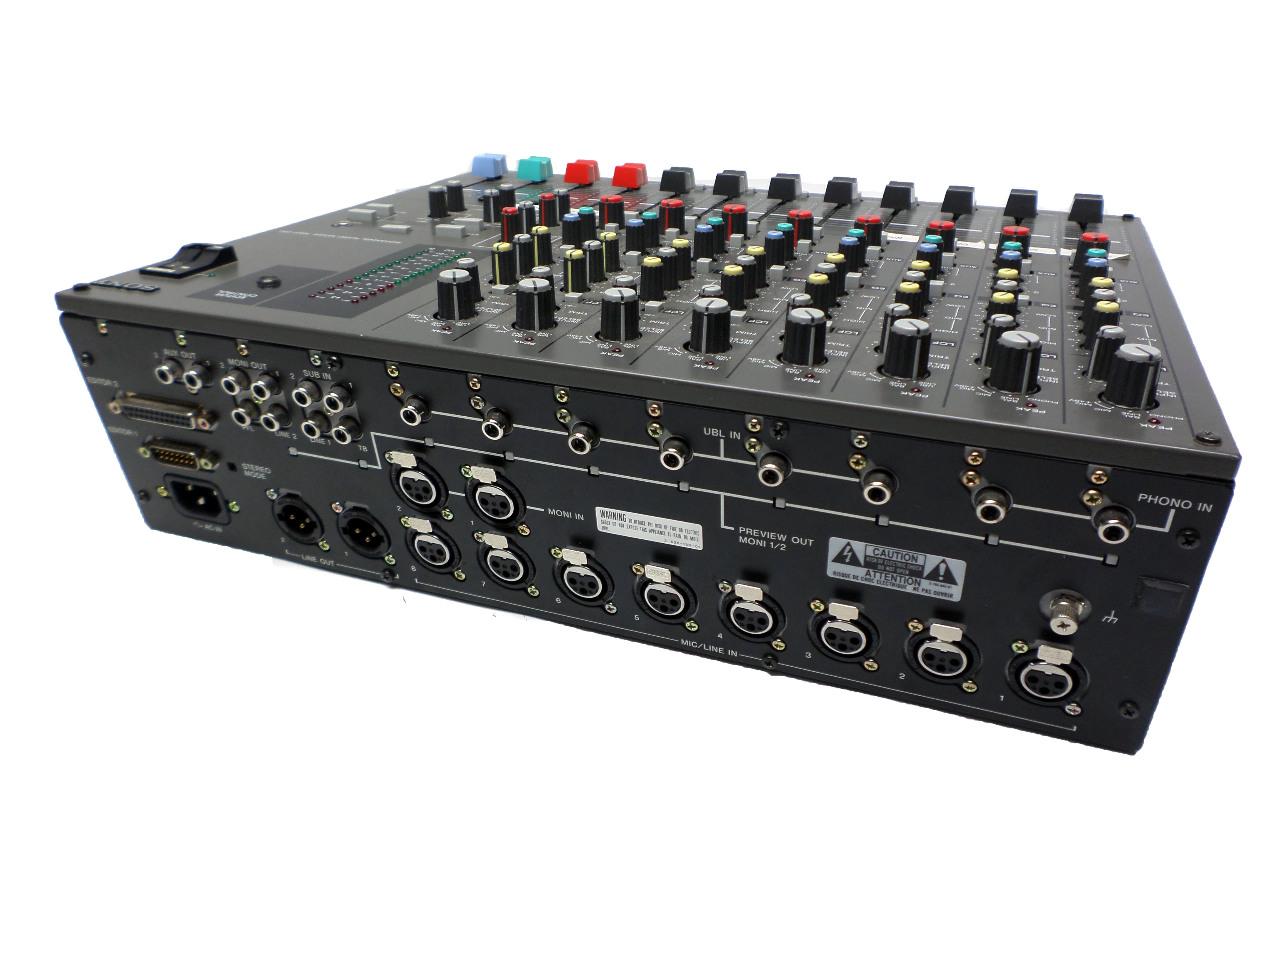 Amazon.com: 8 channel audio mixer